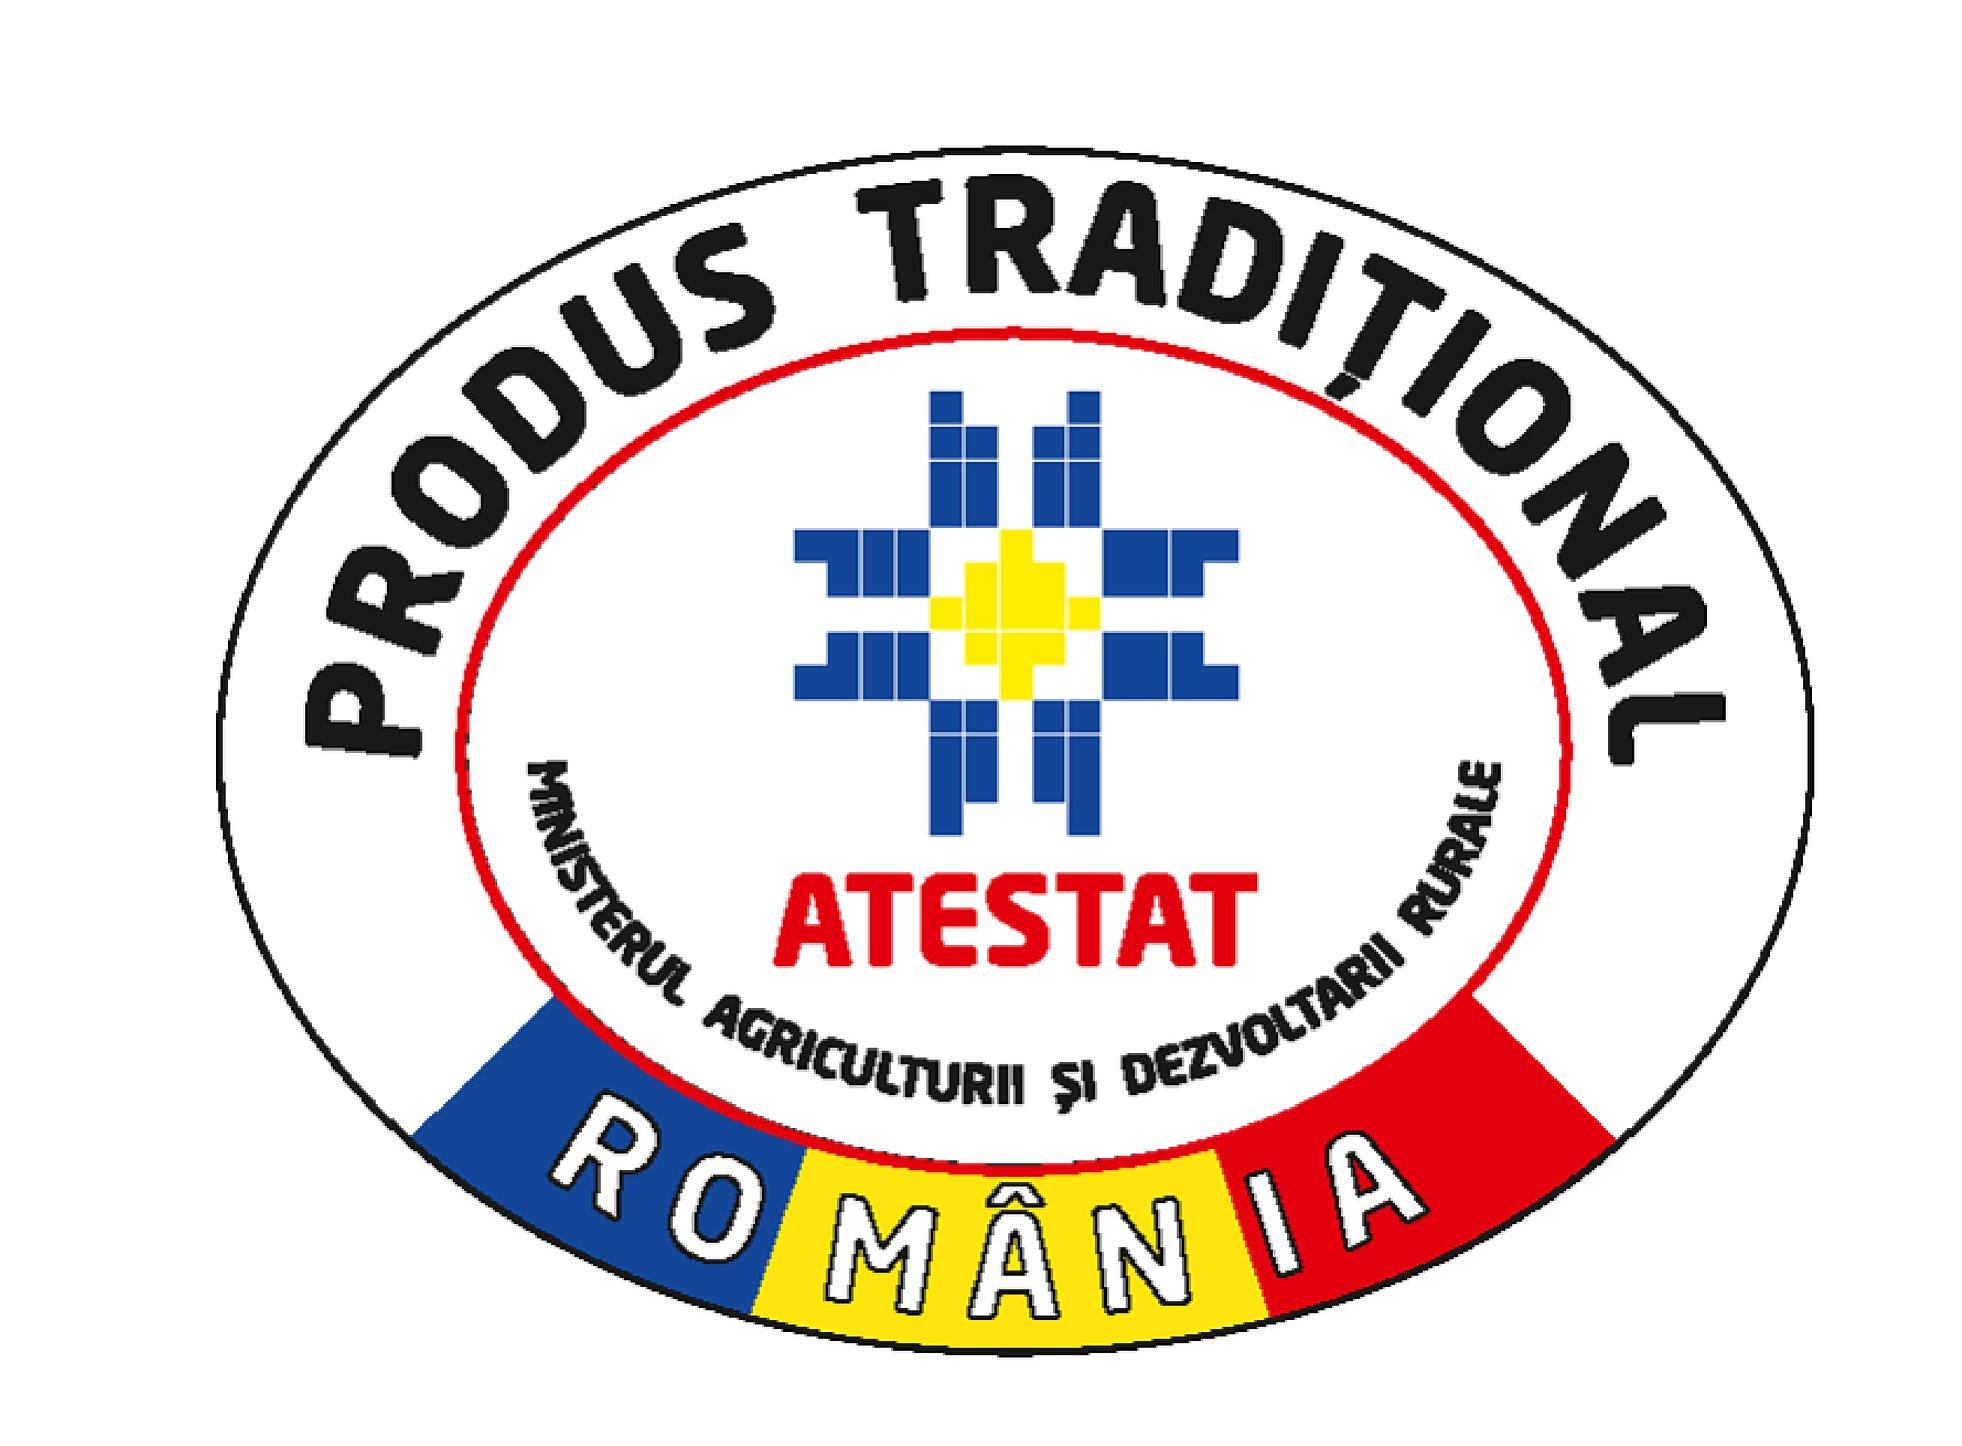 Sase produse traditionale atestate in Capitala